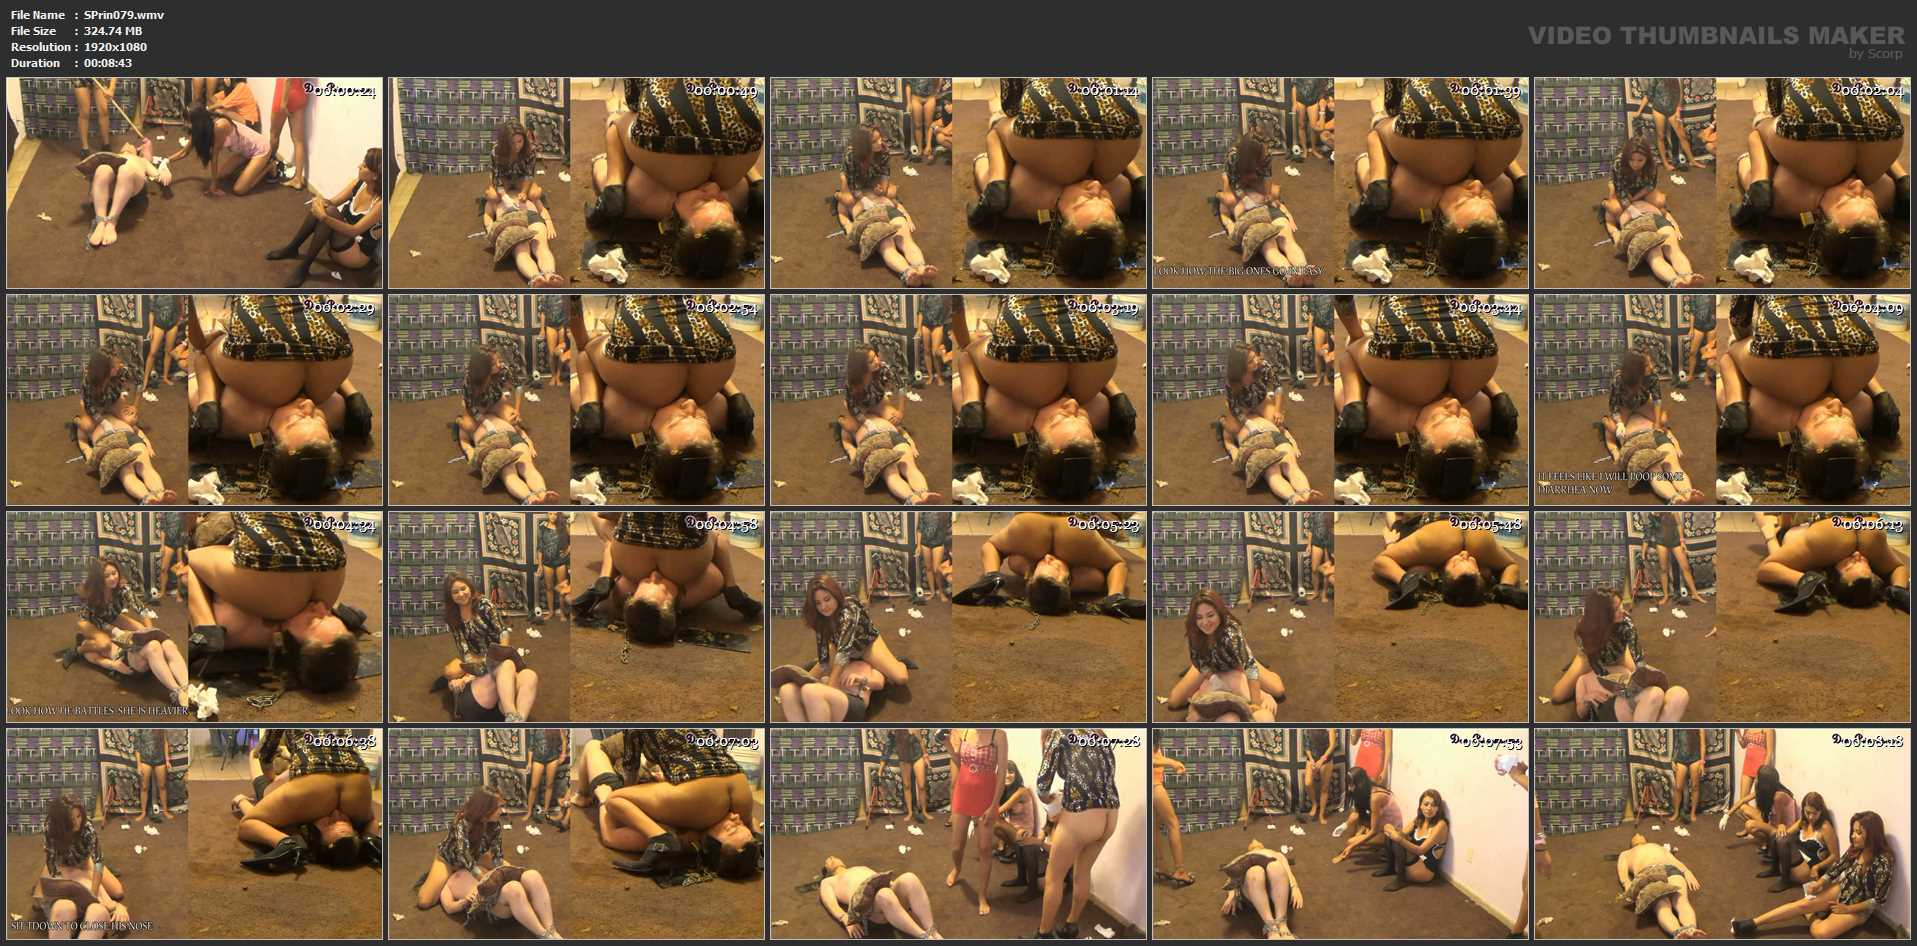 [SCAT-PRINCESS] Horse Back Riding Princess Style II Part 3 Perla [FULL HD][1080p][WMV]